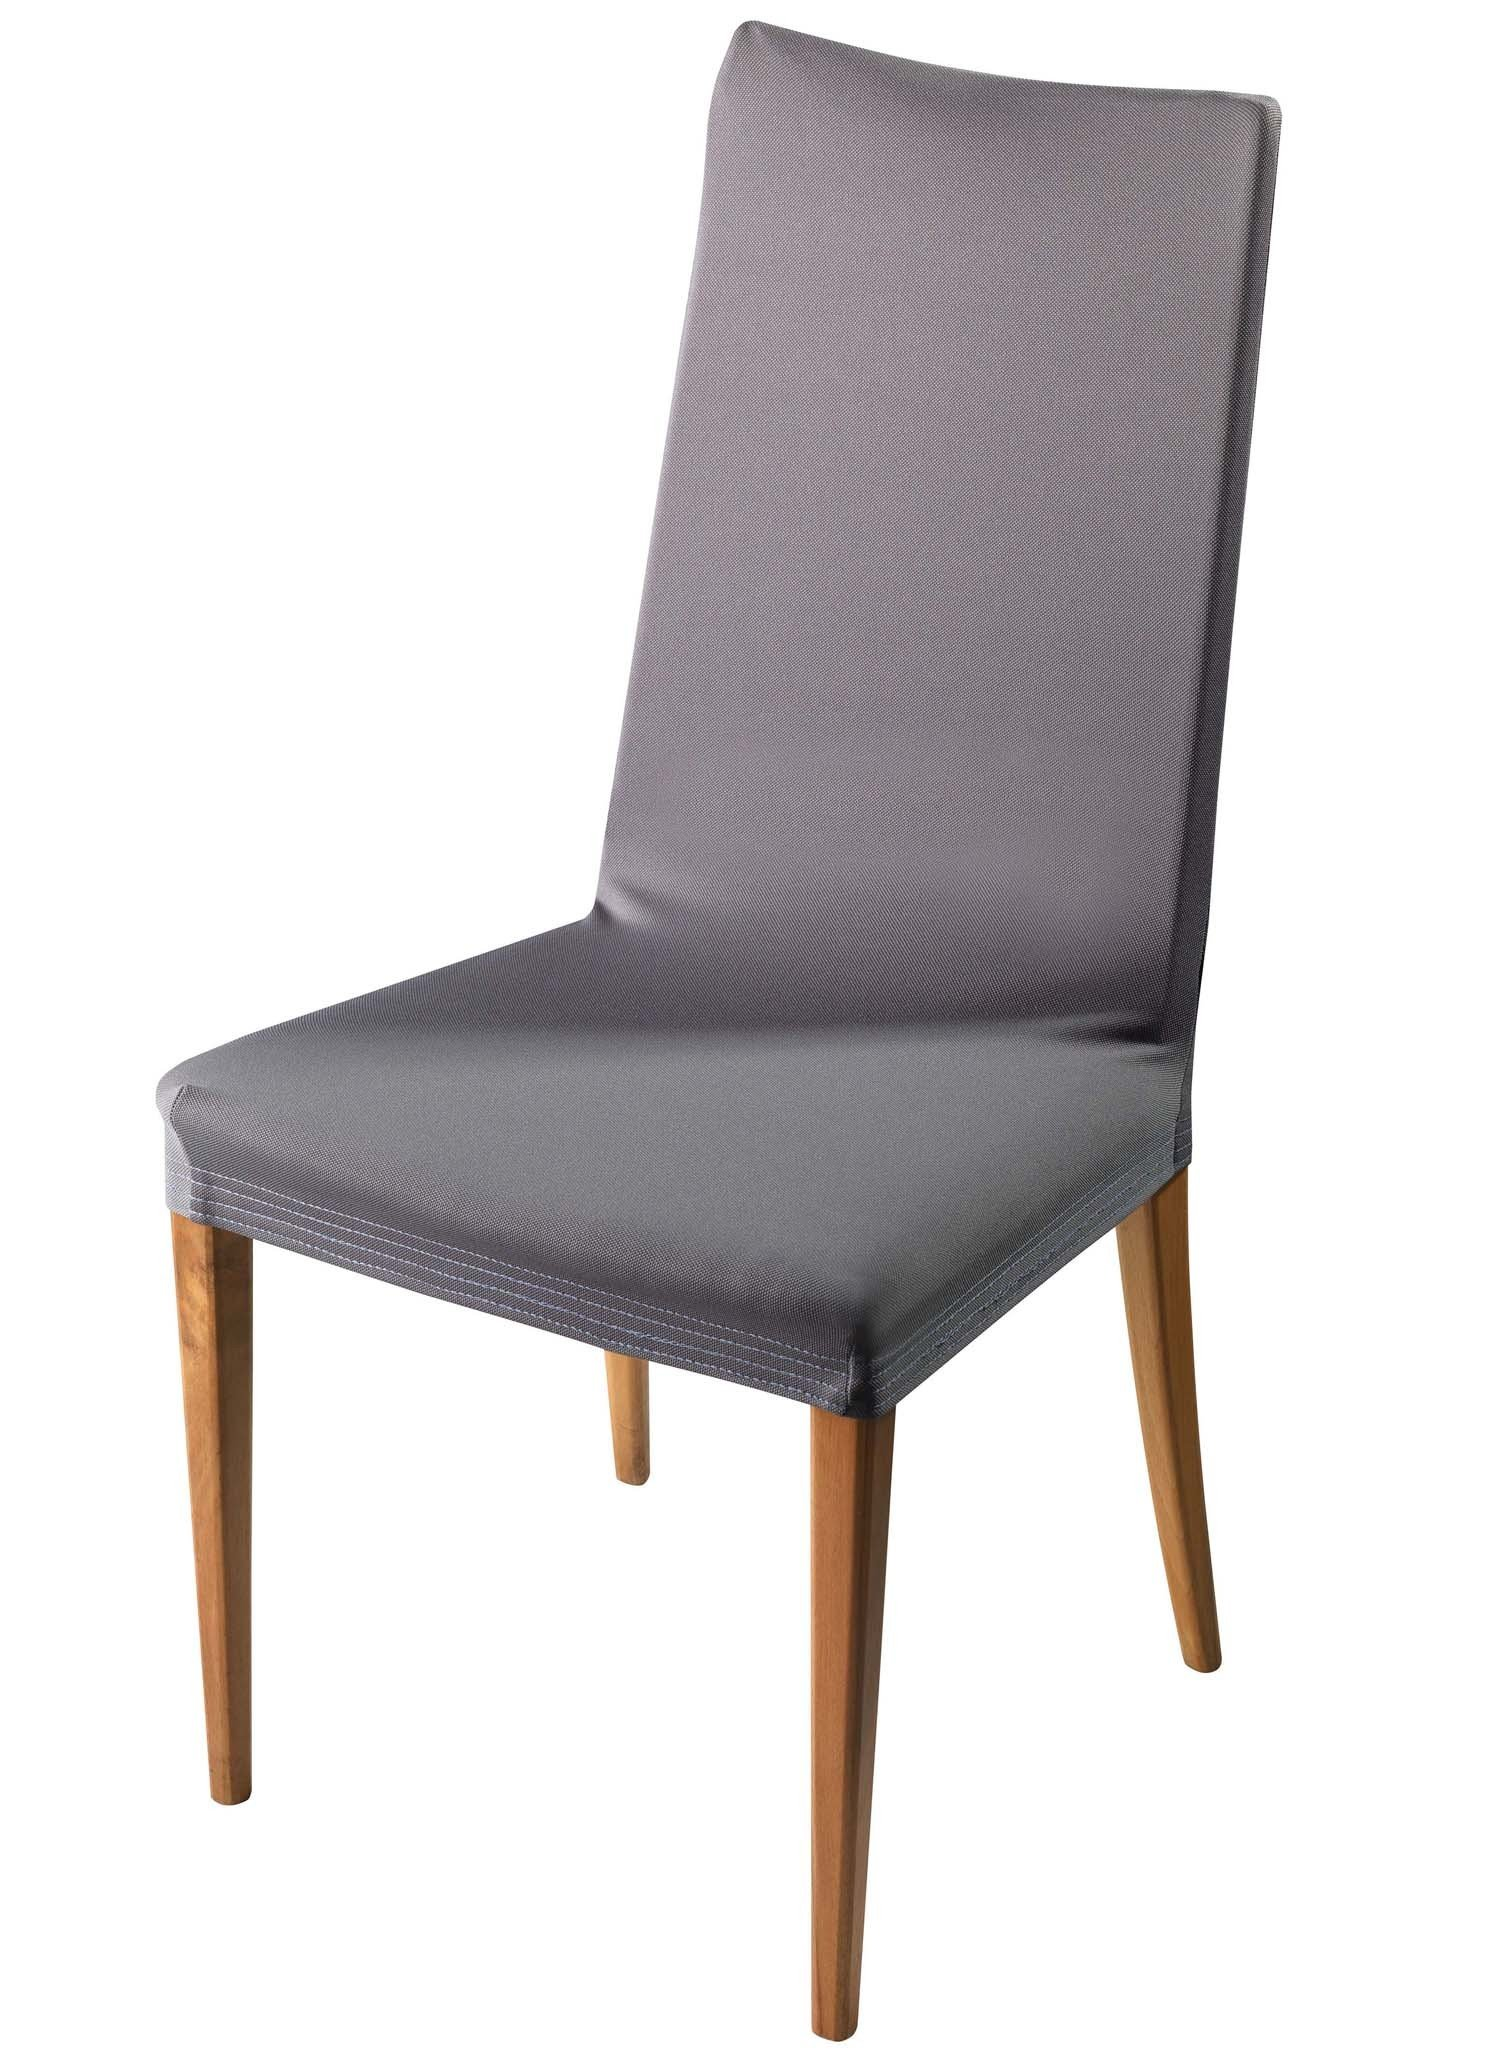 Schonbezug,Stühle grau 2St. - 3 - Ronja.ch